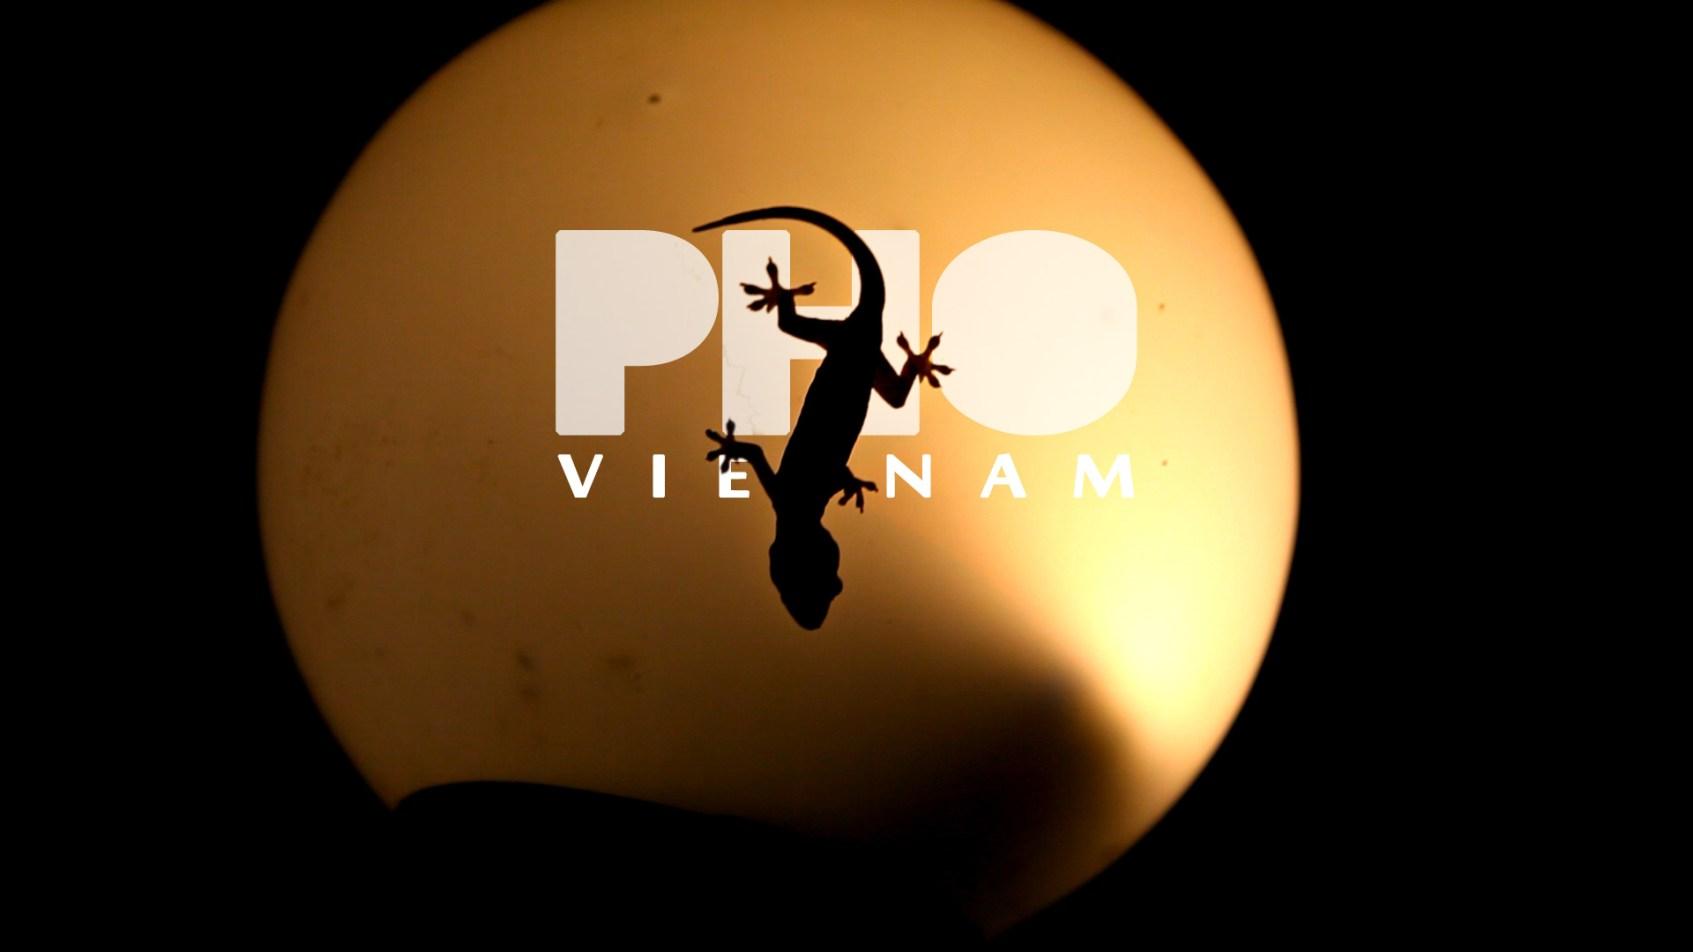 Thumbnail trailer Pho Vietnam (foto: Kim Le Cao © Pho Vietnam)